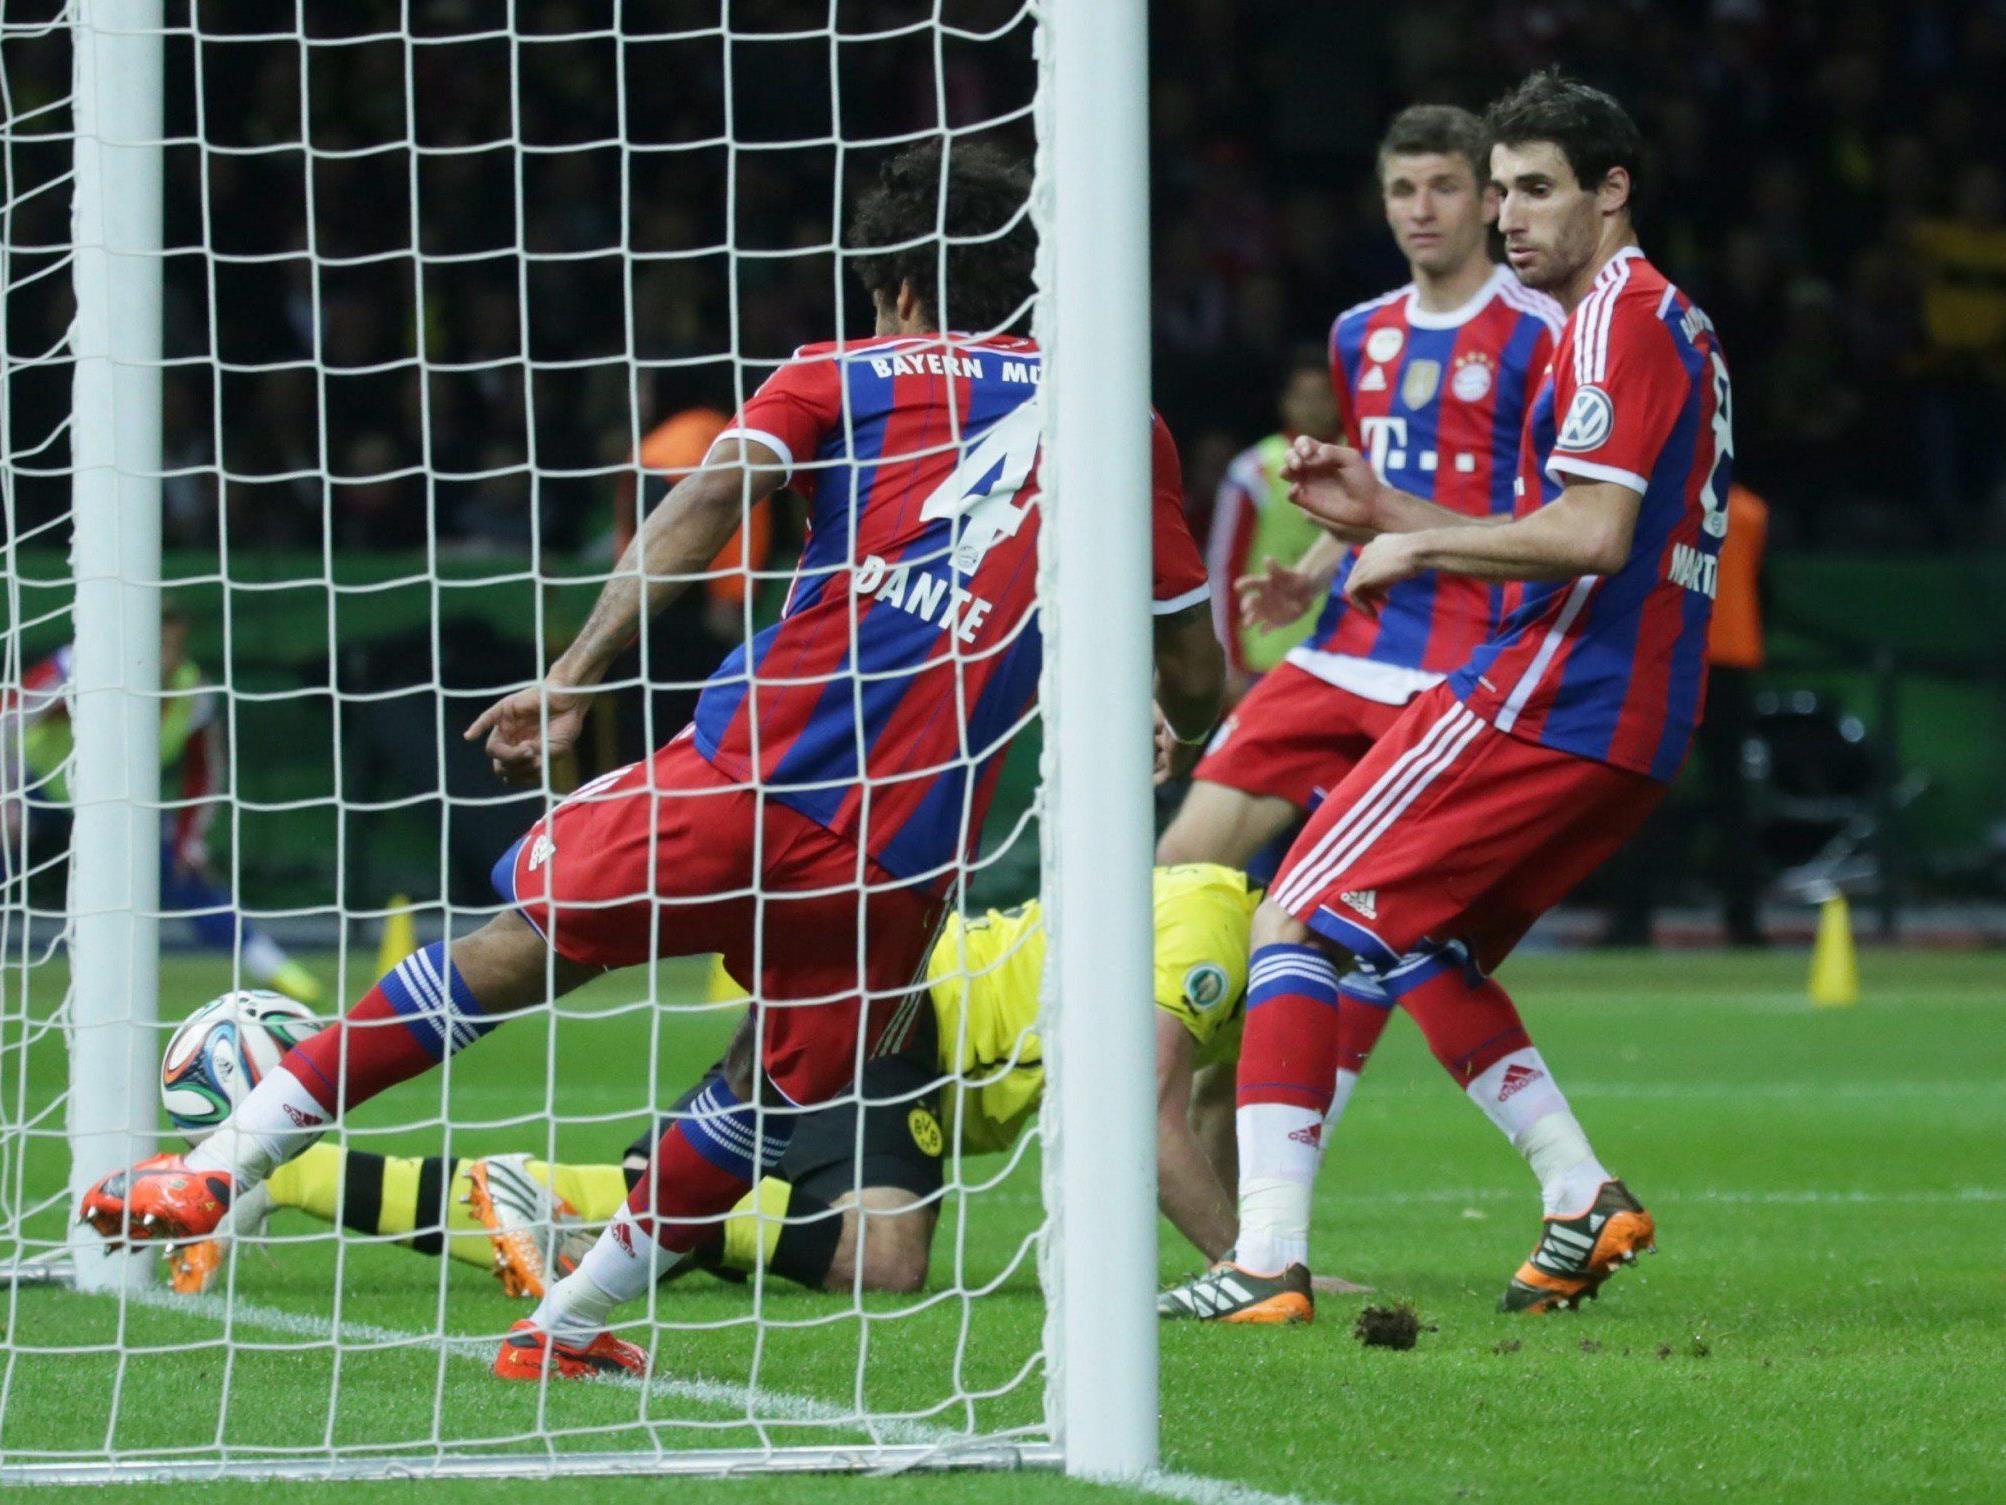 Die strittige Szene in der 64. Minute des DFB-Pokalfinales.